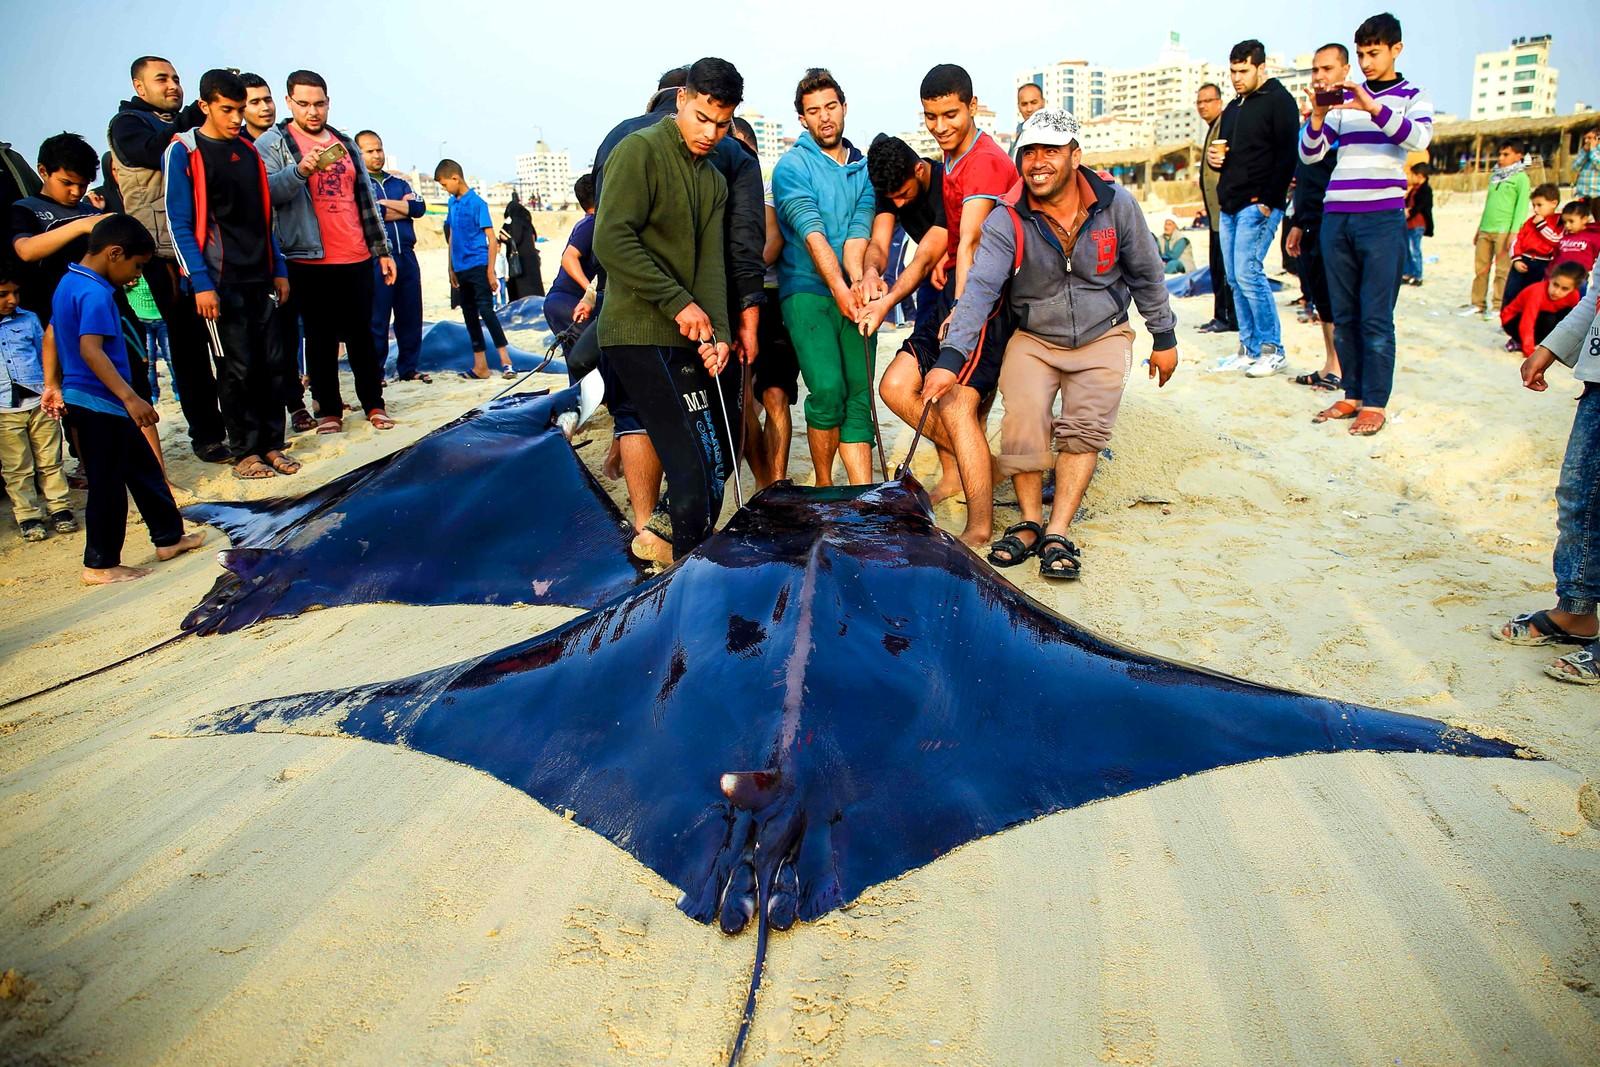 Palestinske fiskere drar piggrokker på land i Gaza.